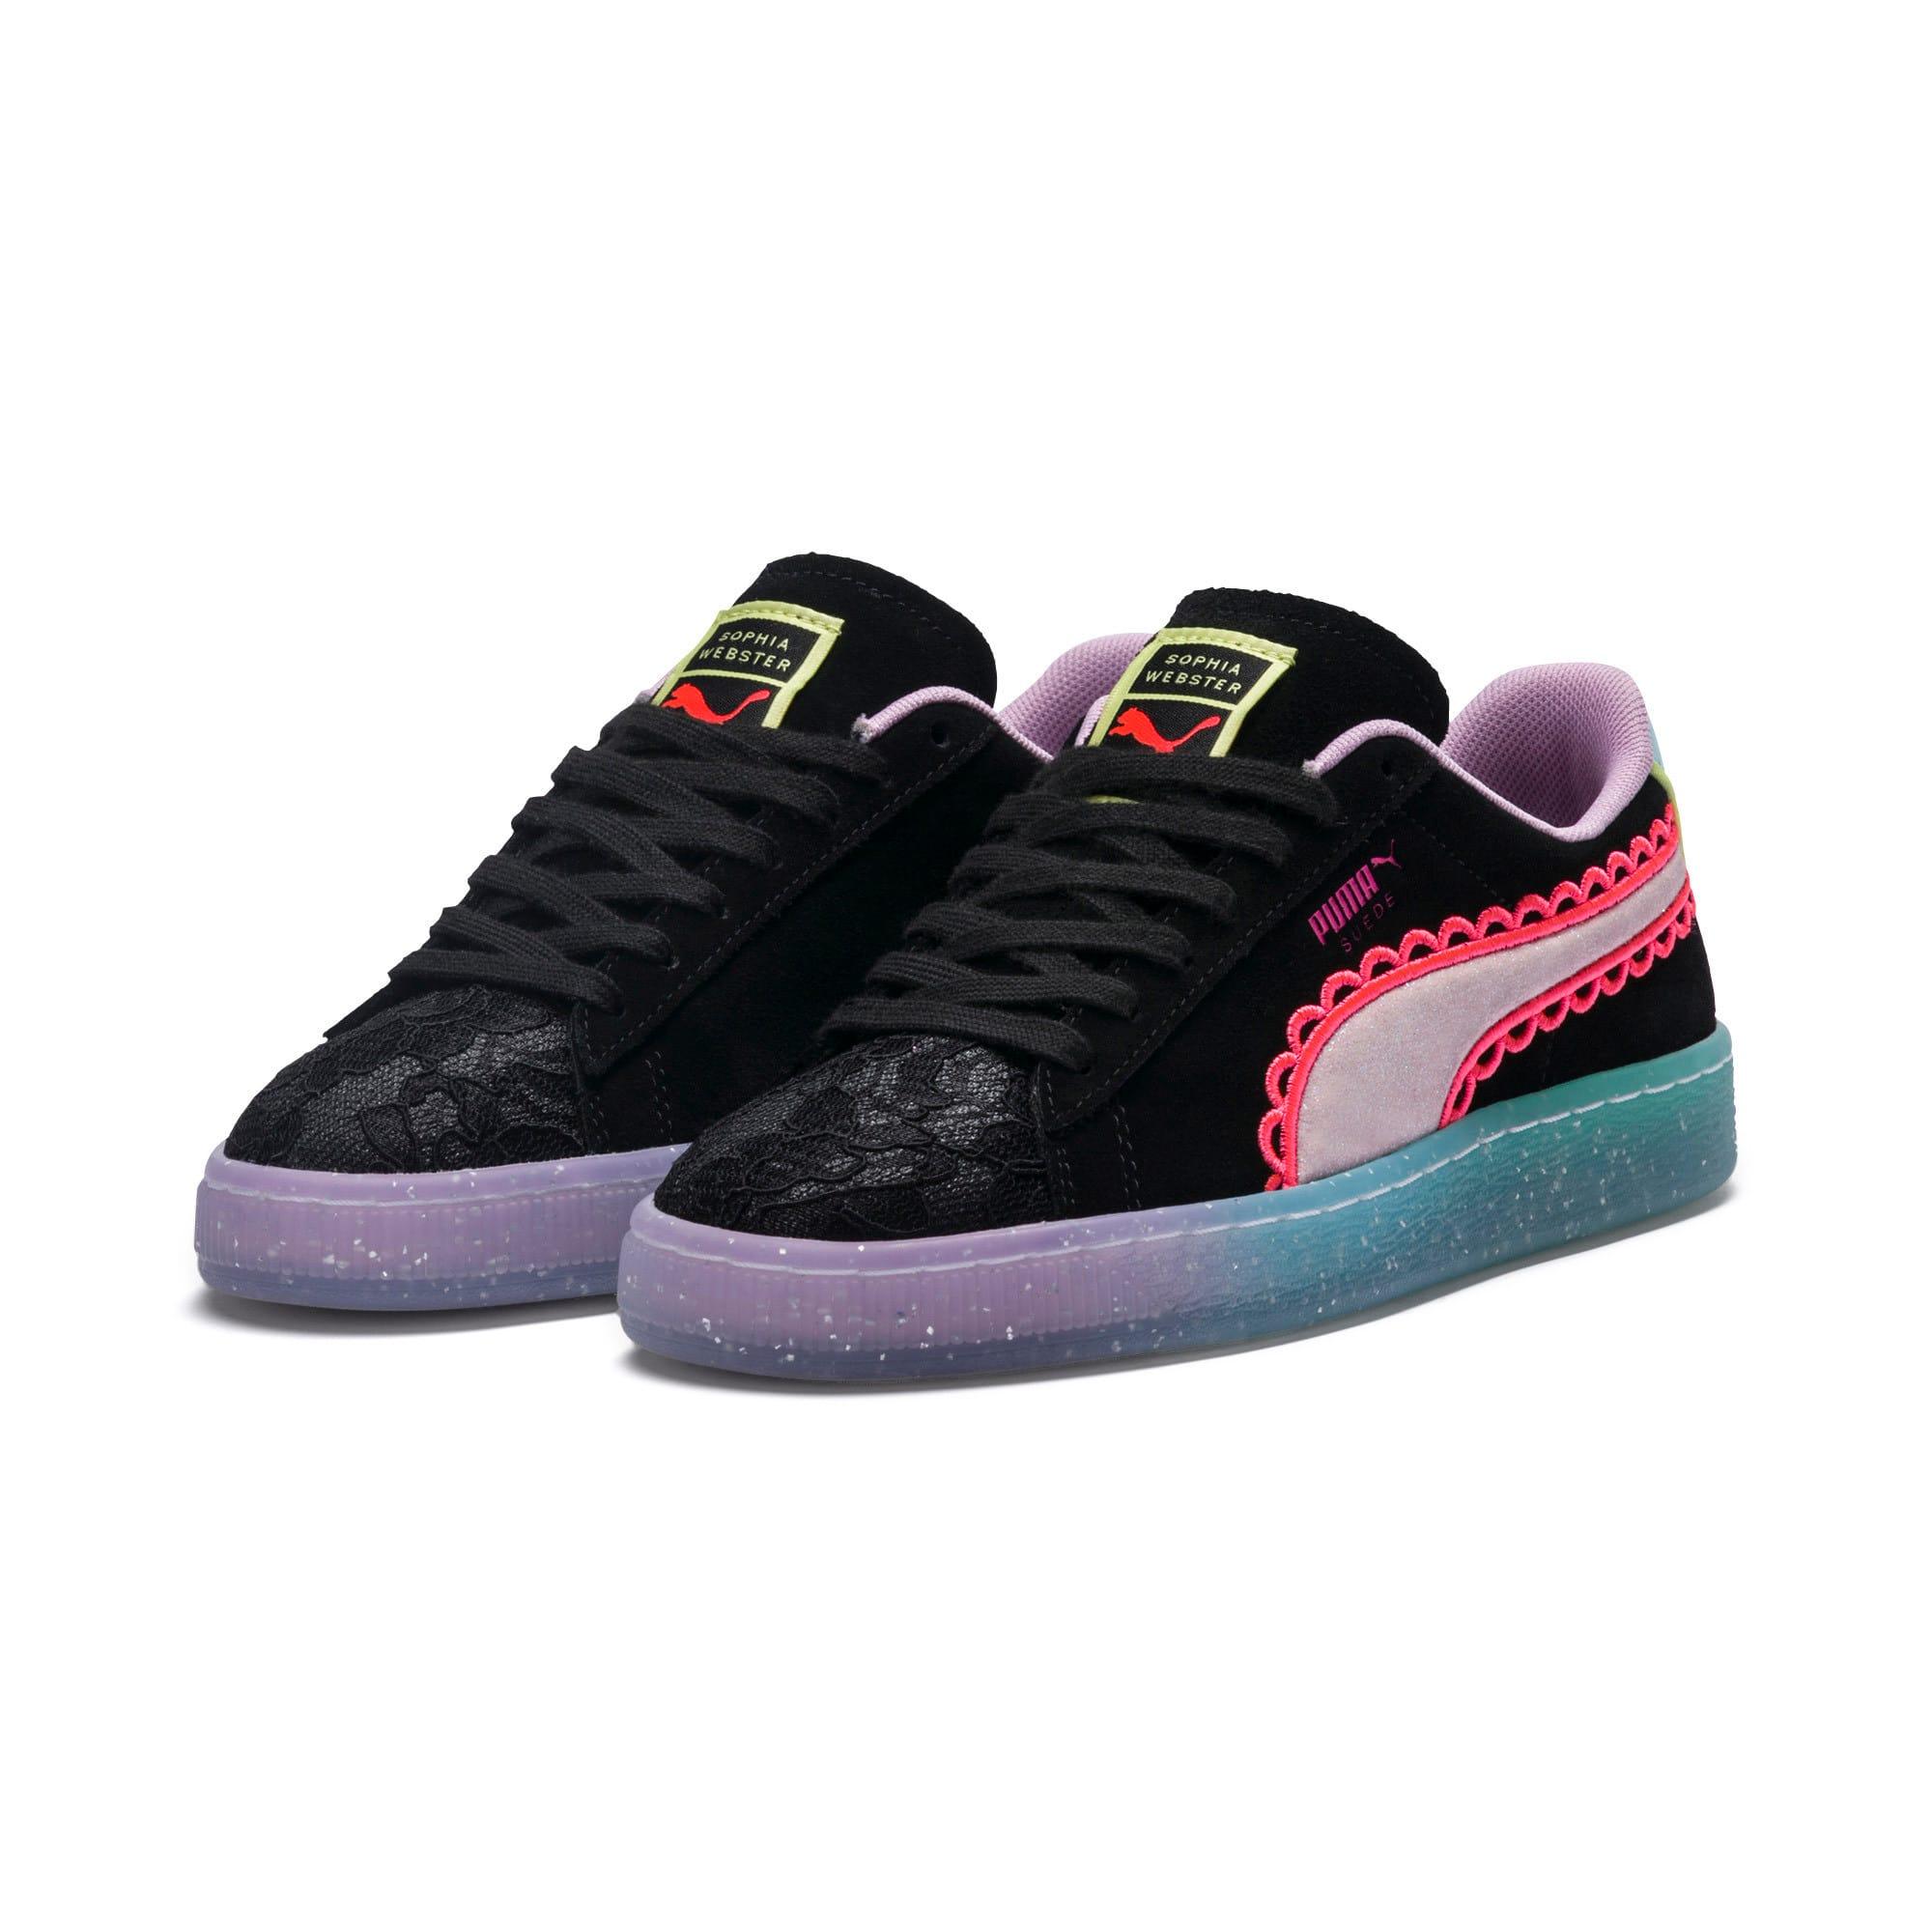 Thumbnail 3 of PUMA x SOPHIA WEBSTER Suede Women's Sneakers, Puma Black-Fiery Coral, medium